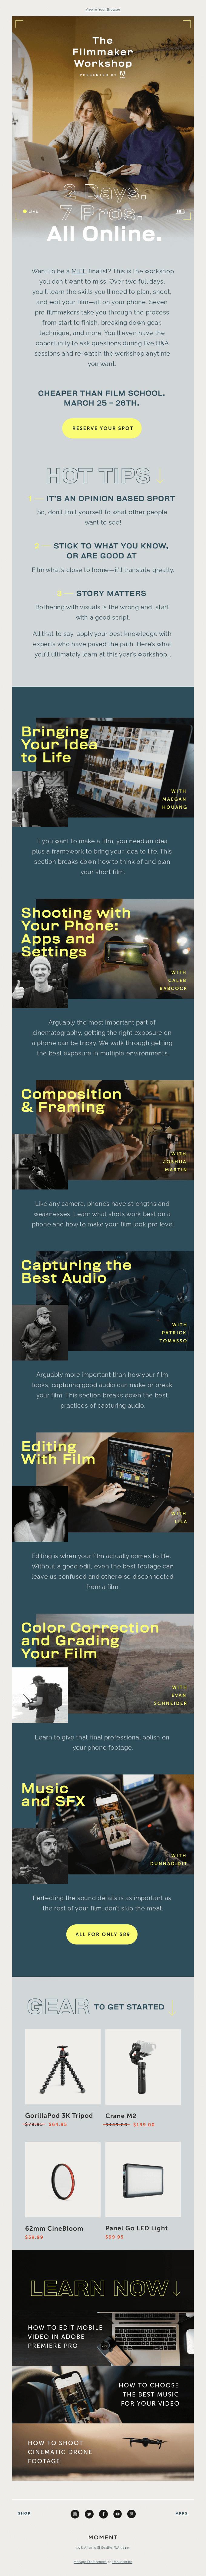 Want to be a better filmmaker? We got you.